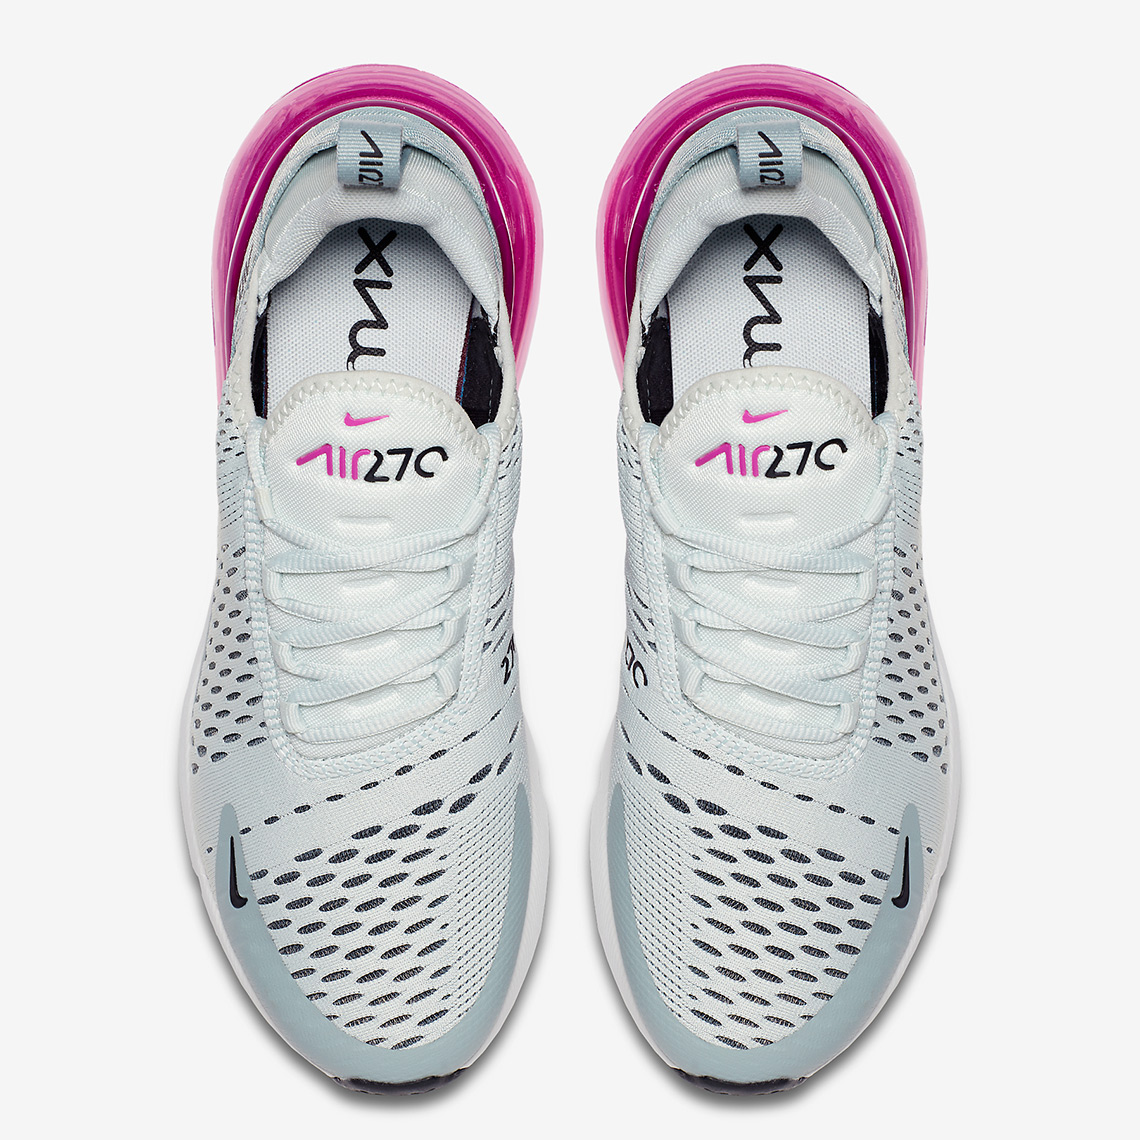 Nike Air Max 270 Rosa Kvinners Joggesko 1ECtYiAEm